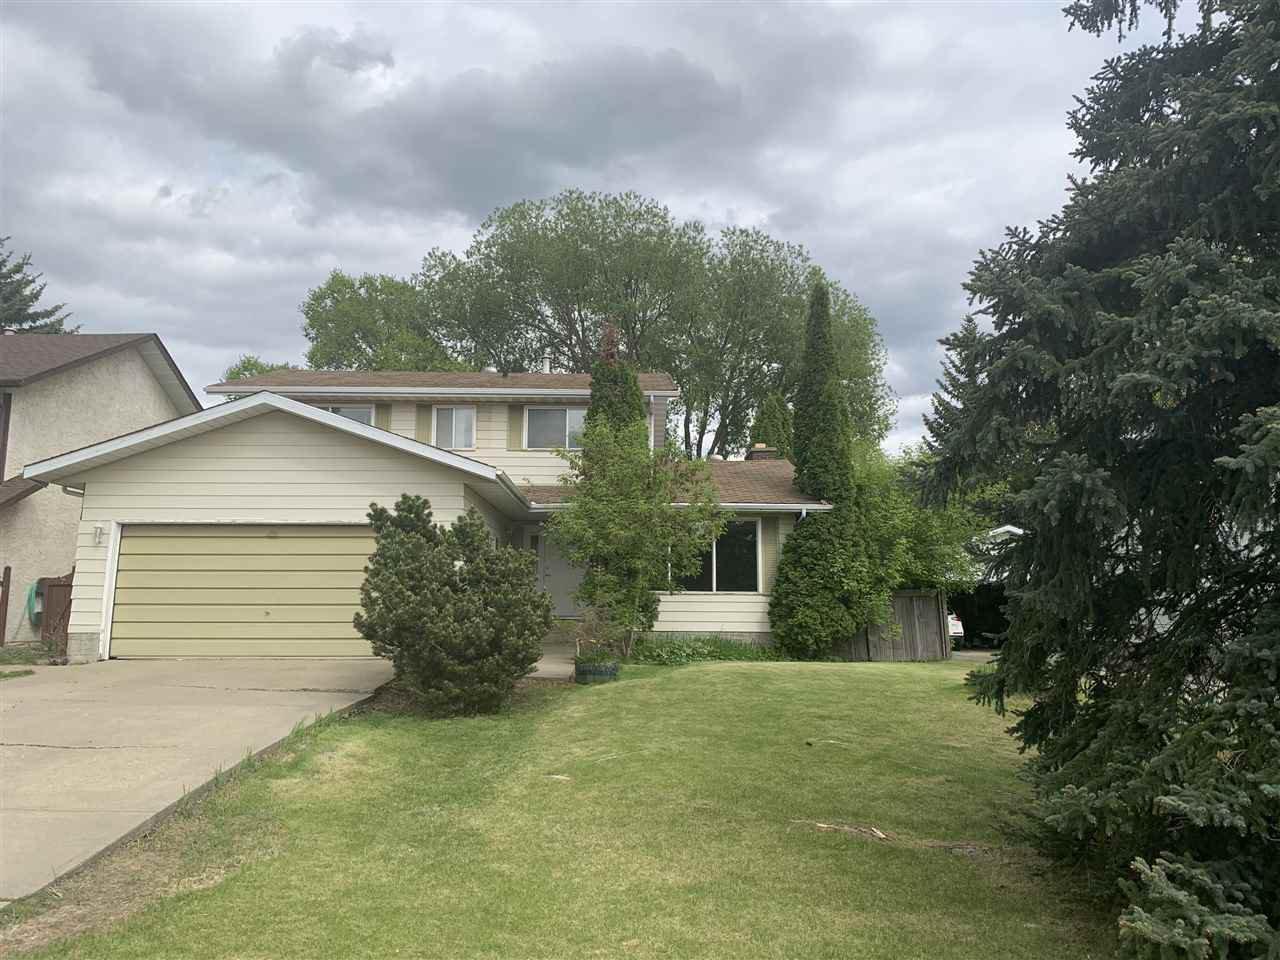 Main Photo: 124 WESTRIDGE Road in Edmonton: Zone 22 House for sale : MLS®# E4199354